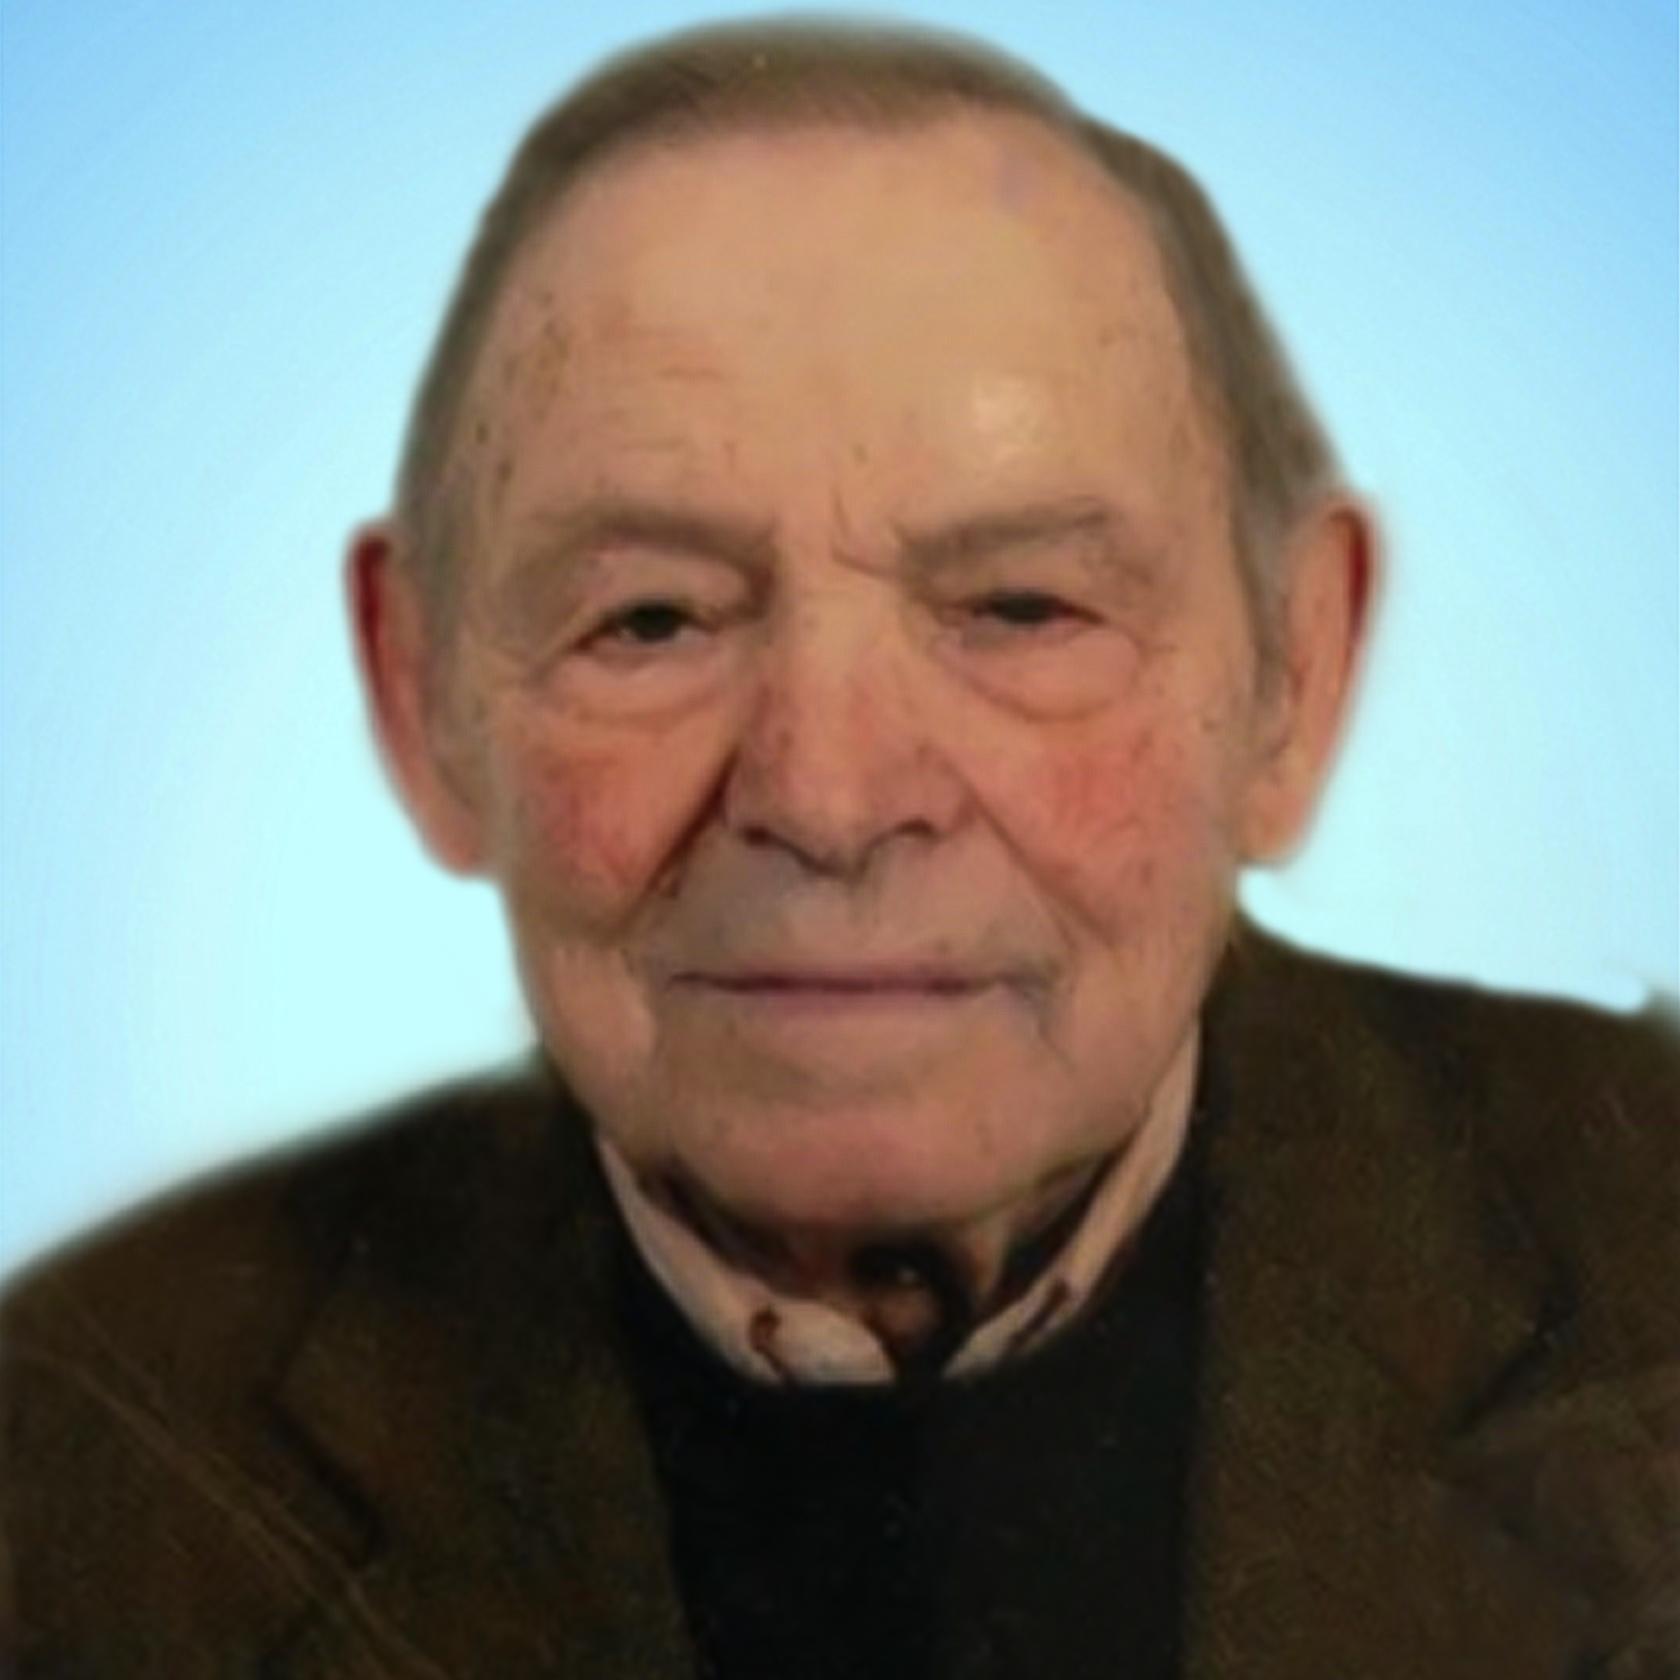 Salvatore Bonavitacola